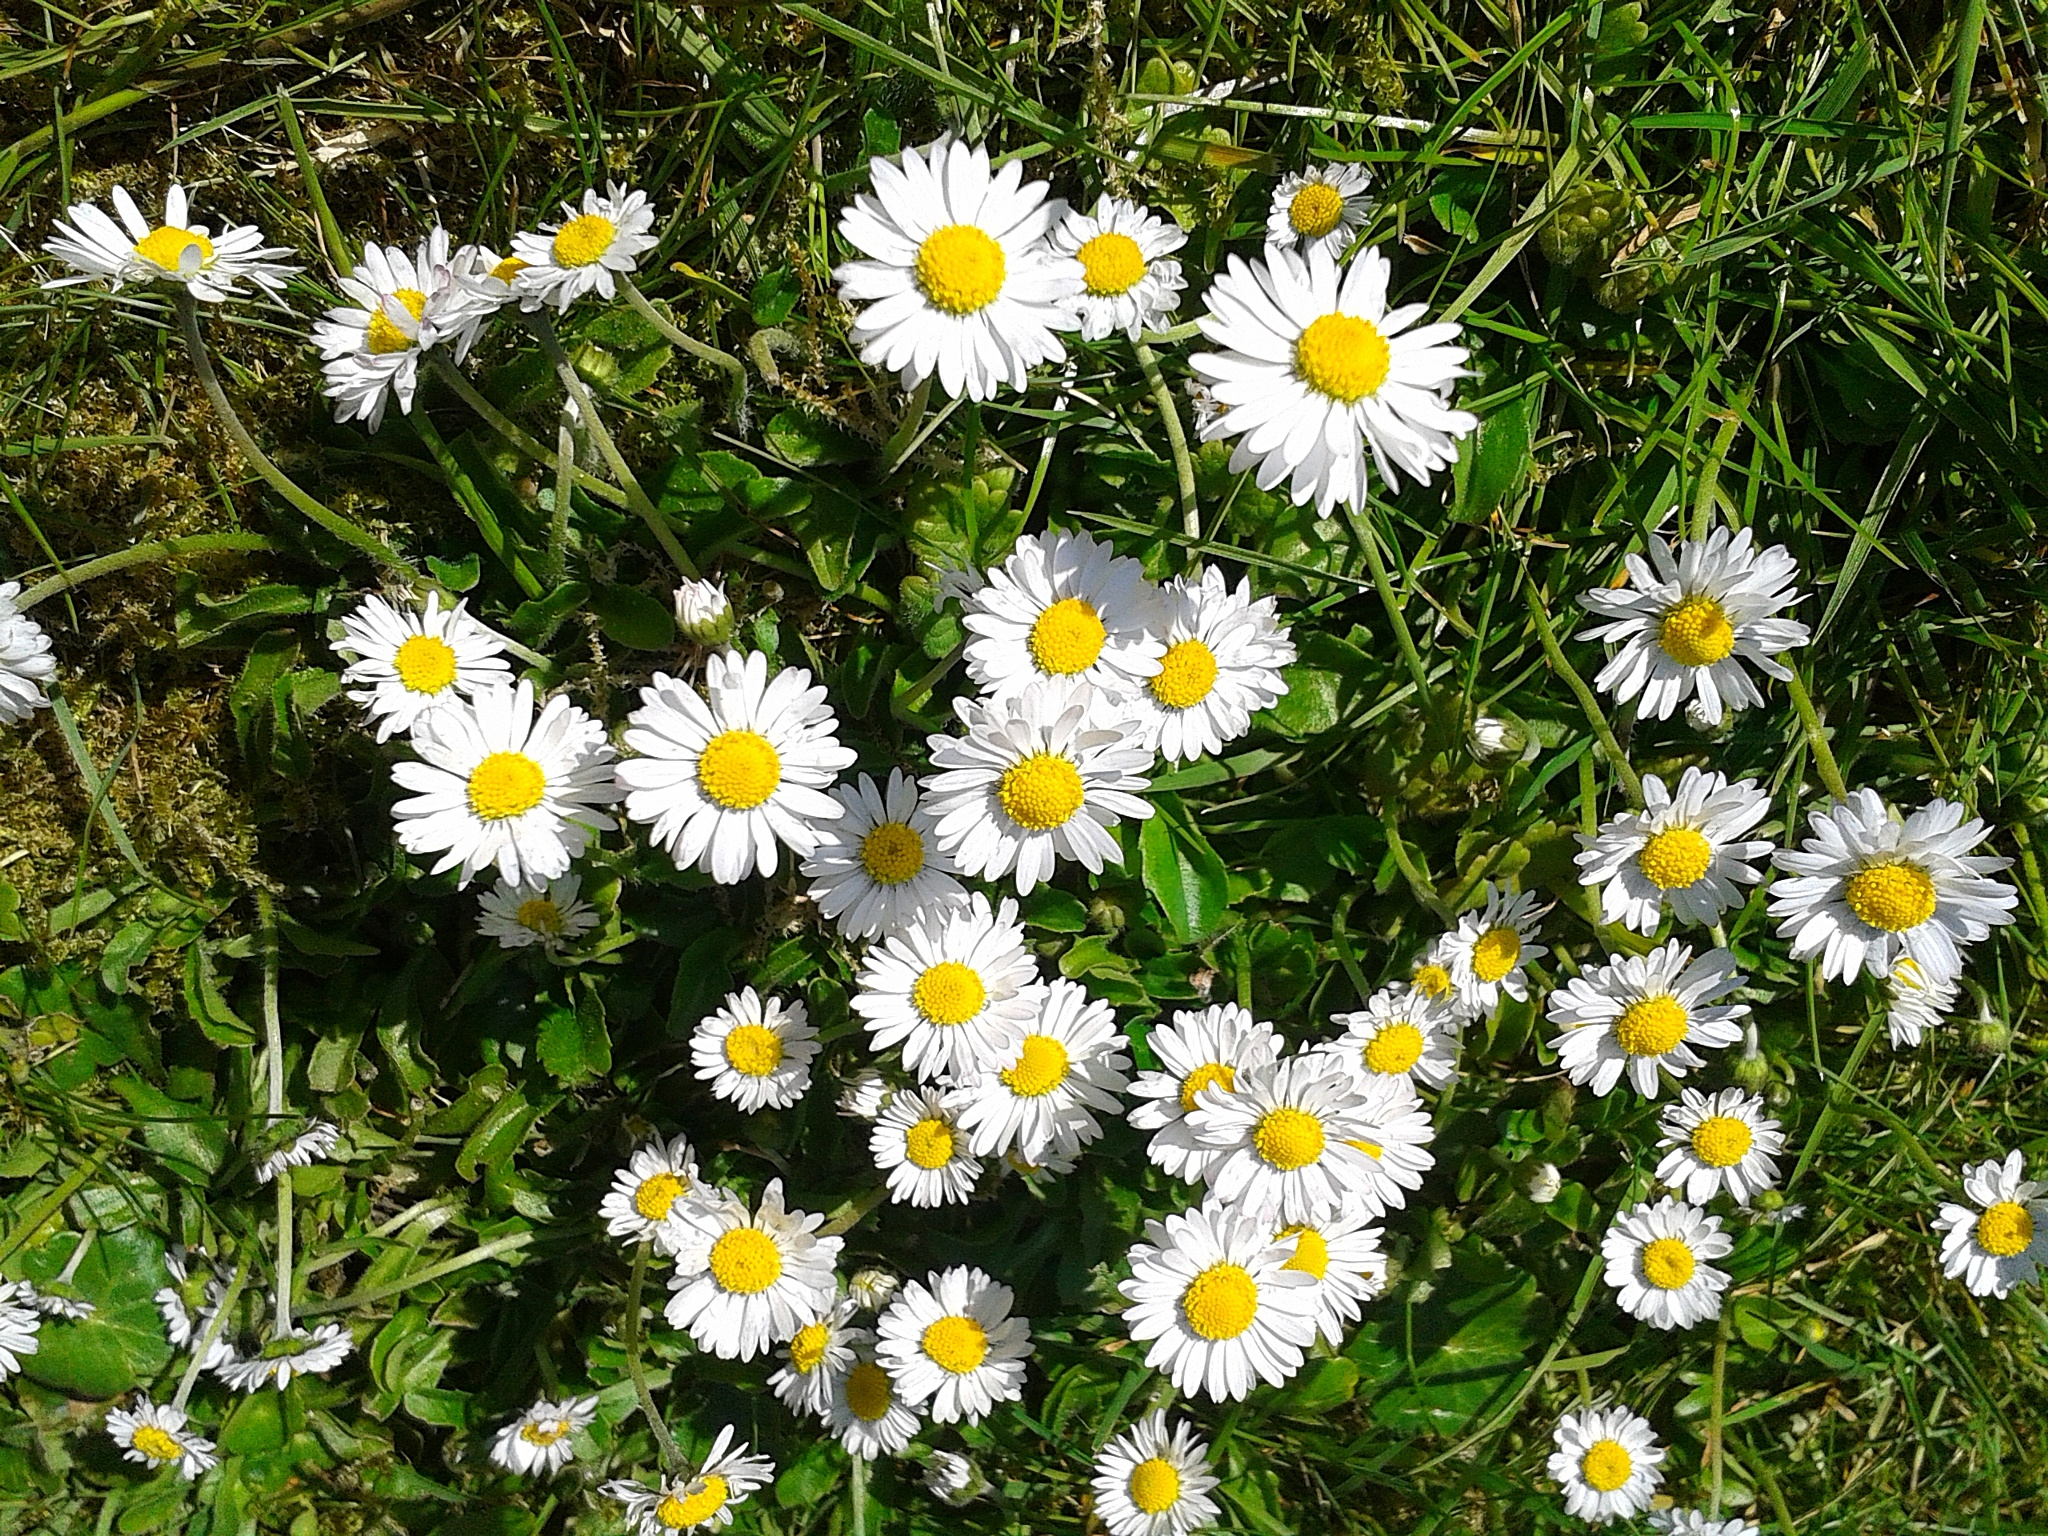 Daisys by Carolin Schmidt